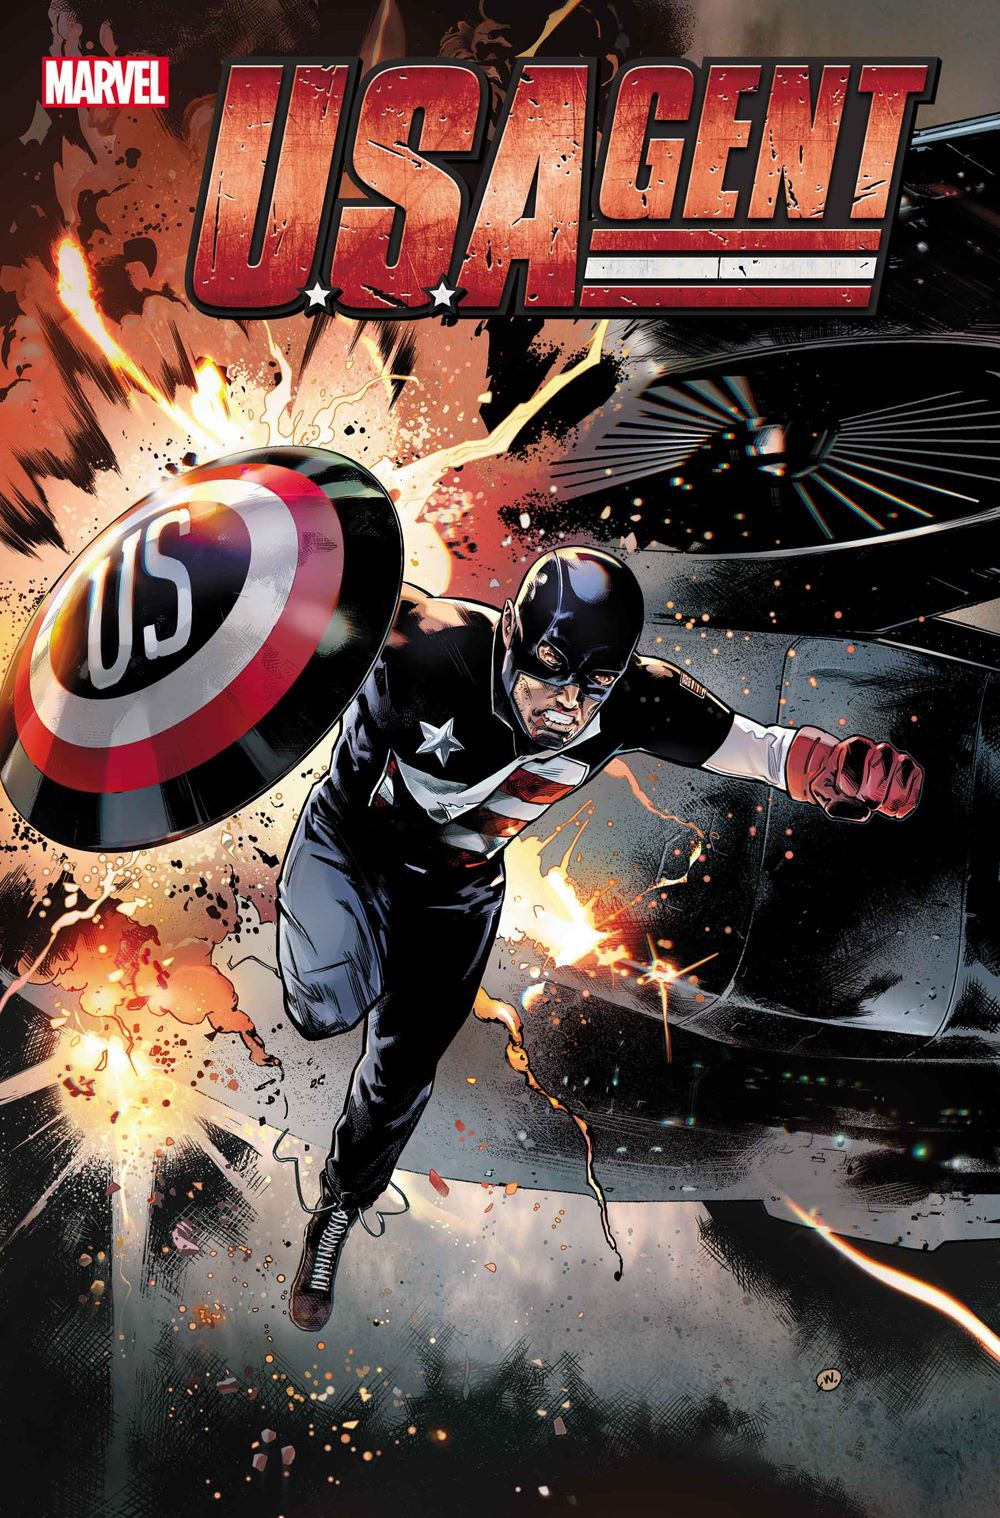 USAGENT2020003_WellBee_Var Marvel Comics January 2021 Solicitations